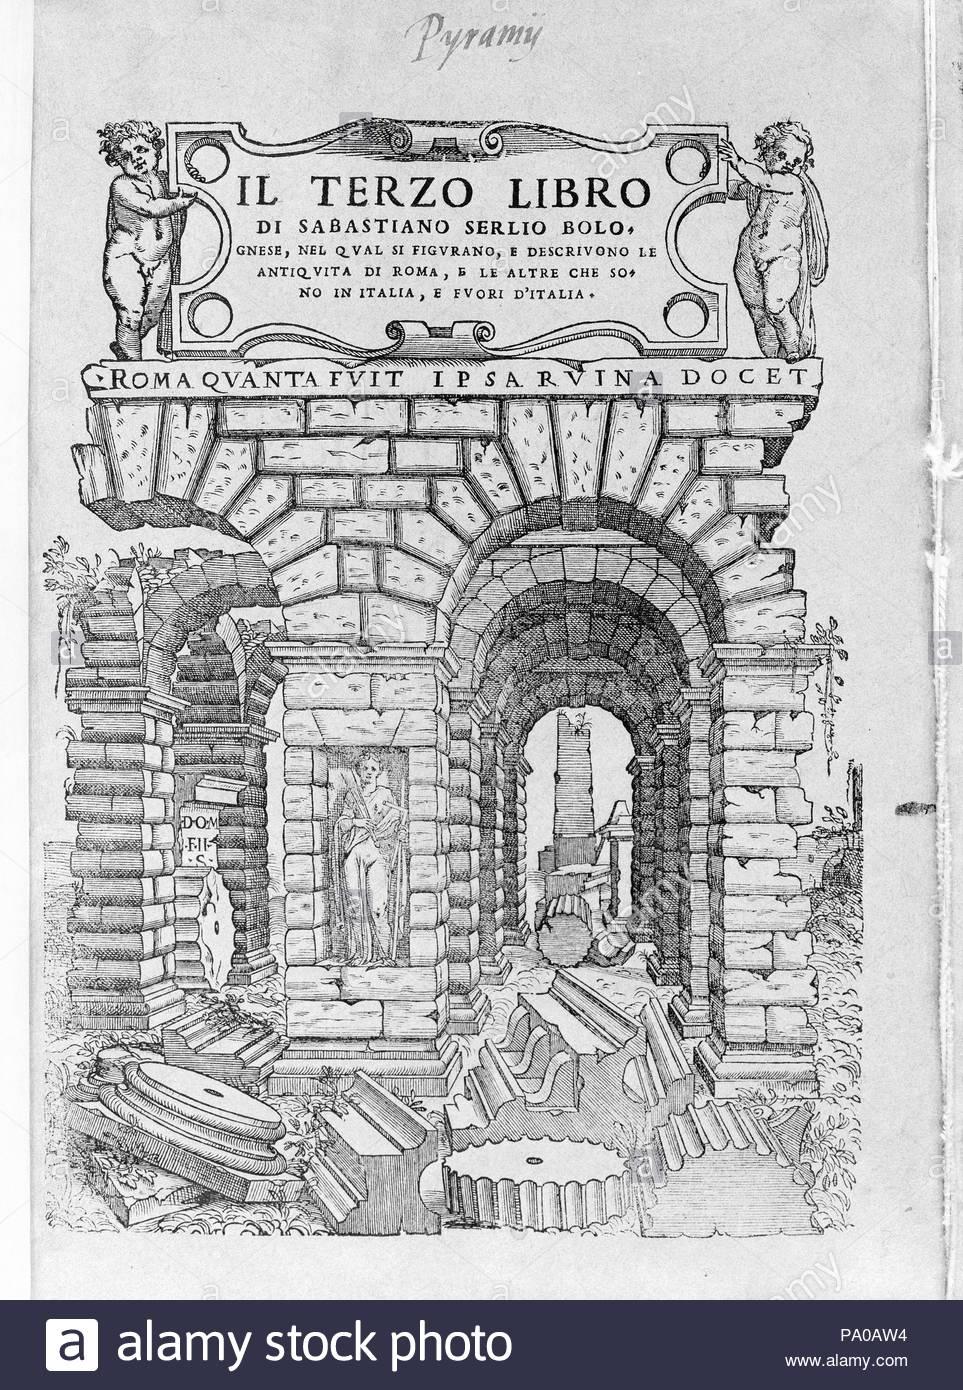 Il terzo libro di Sabastiano Serlio Bolognese, 1540, Printed book with woodcut illustrations, 15 11/16 x 10 5/8 x 13/16 in. (39.8 x 27 x 2 cm). - Stock Image